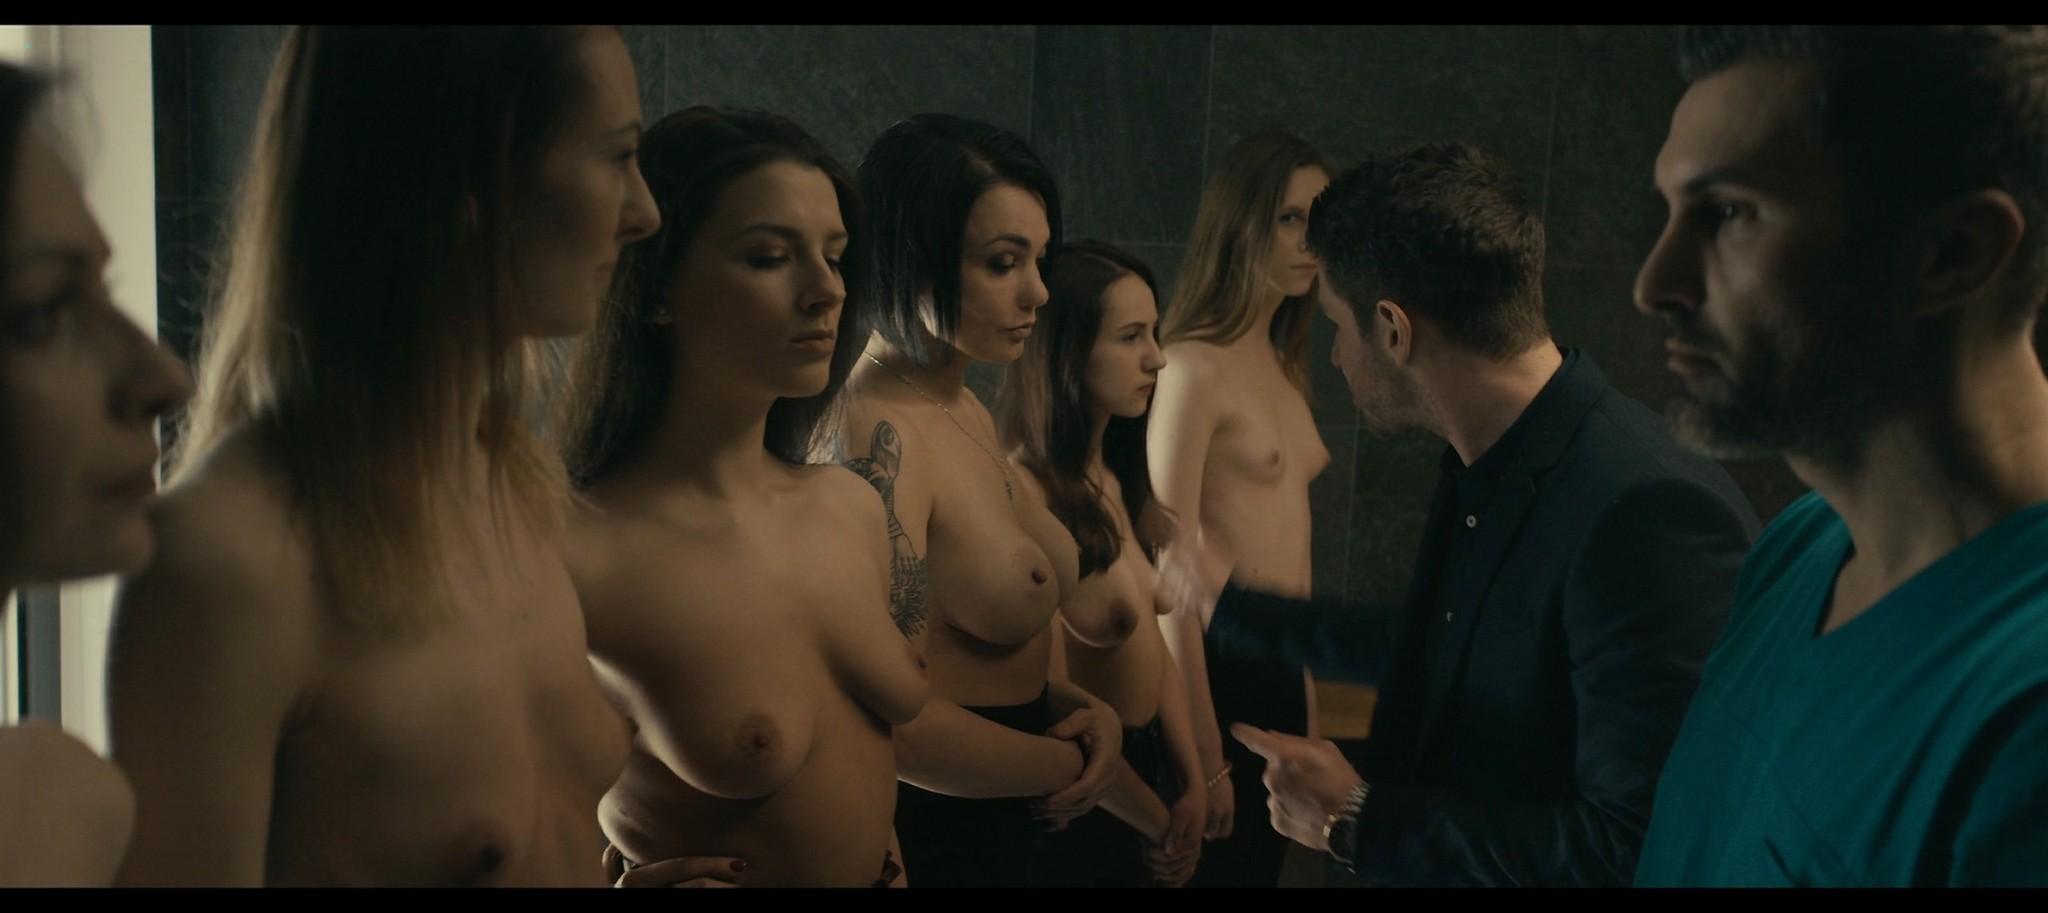 Katarzyna Warnke sex Aleksandra Nowicka Karolina Dziuba nude Petla PL 2020 1080 BluRay 19